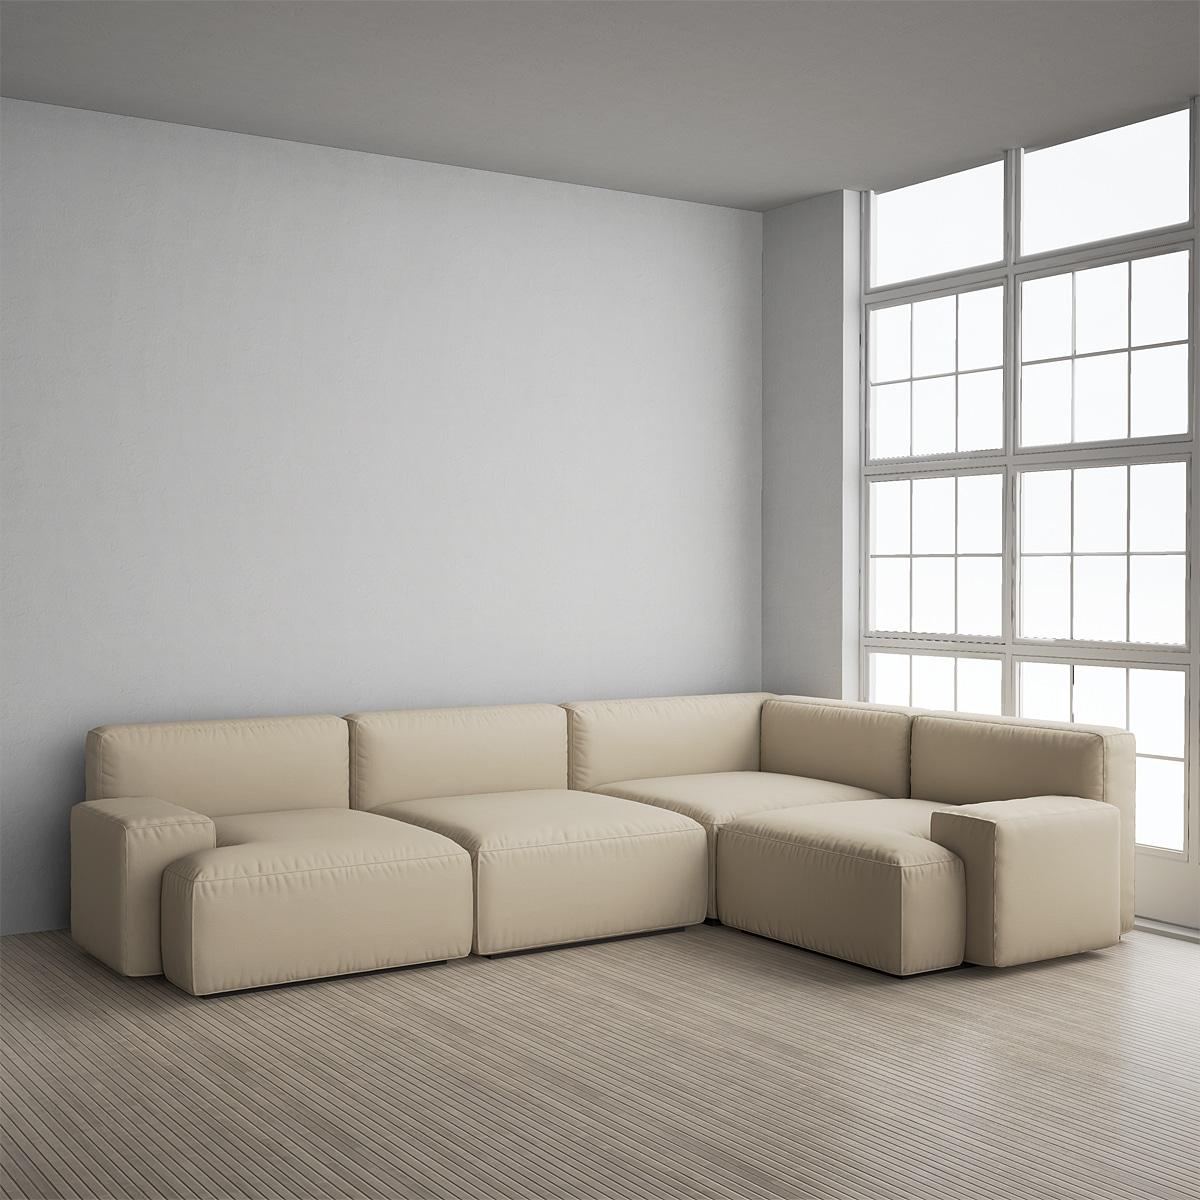 cassina mex cube sofa 01 ue4arch. Black Bedroom Furniture Sets. Home Design Ideas